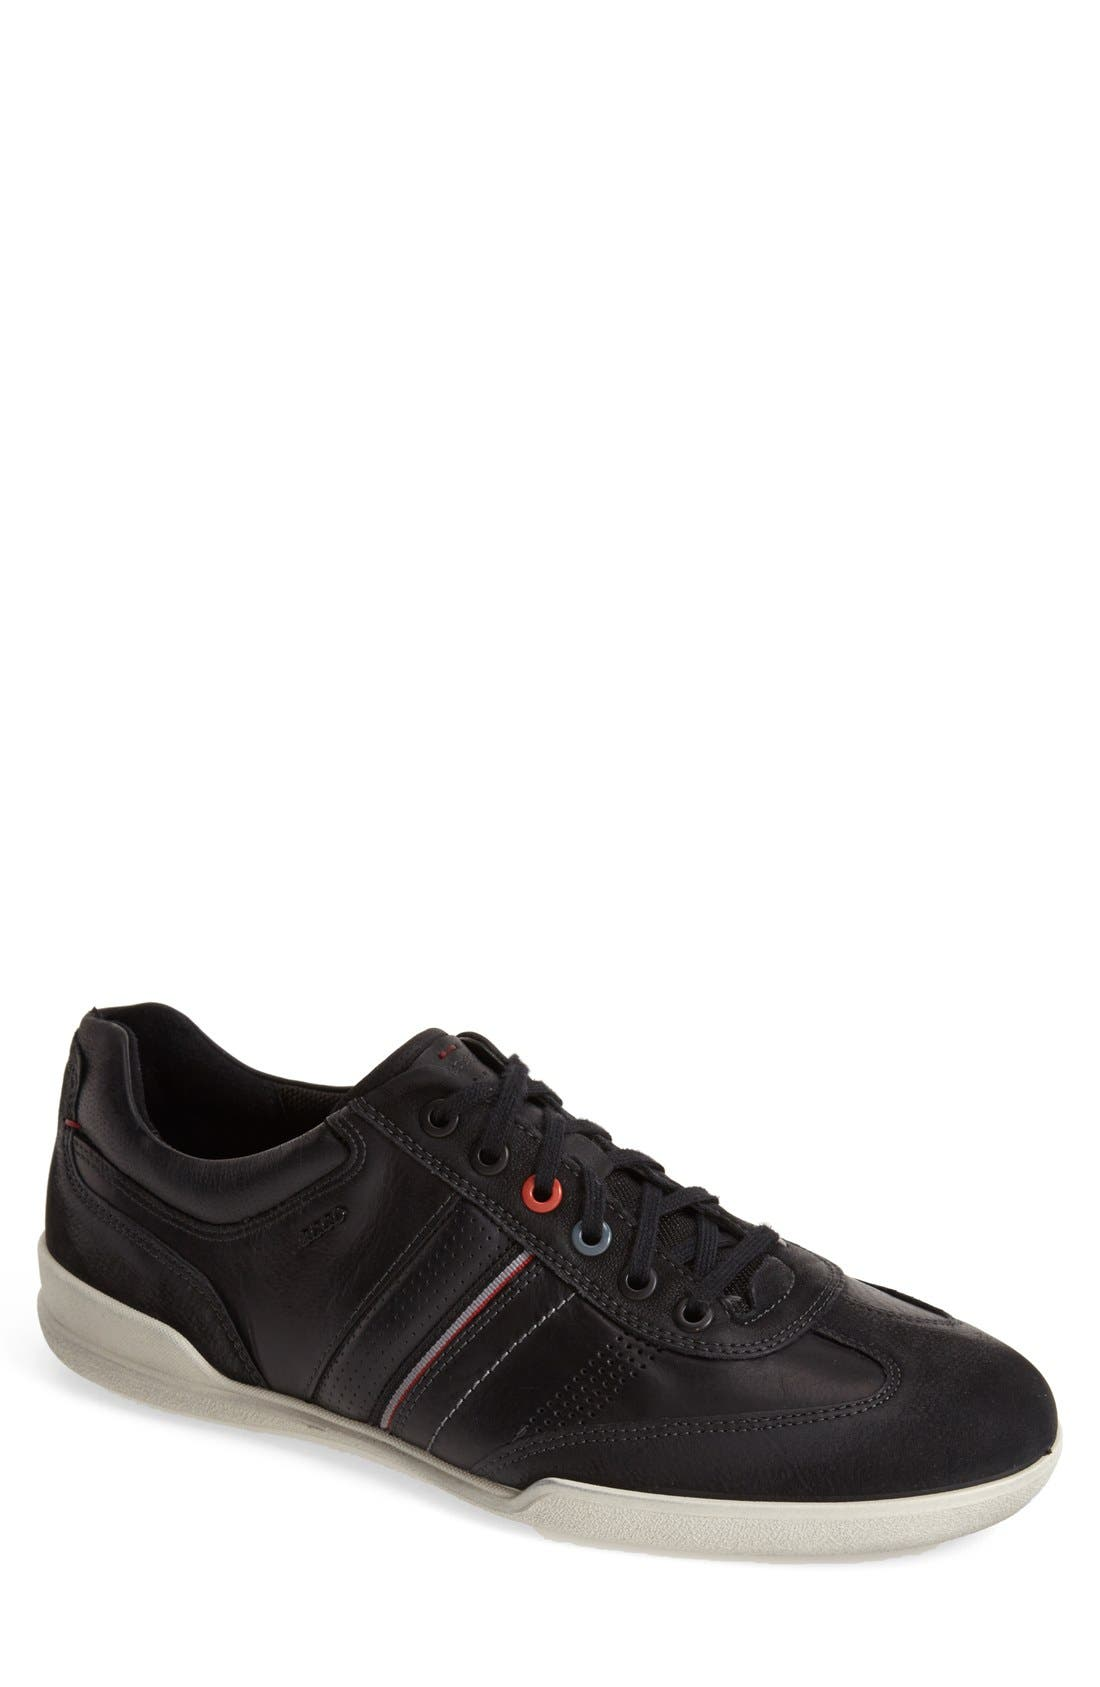 'Enrico' Sneaker,                             Main thumbnail 1, color,                             001